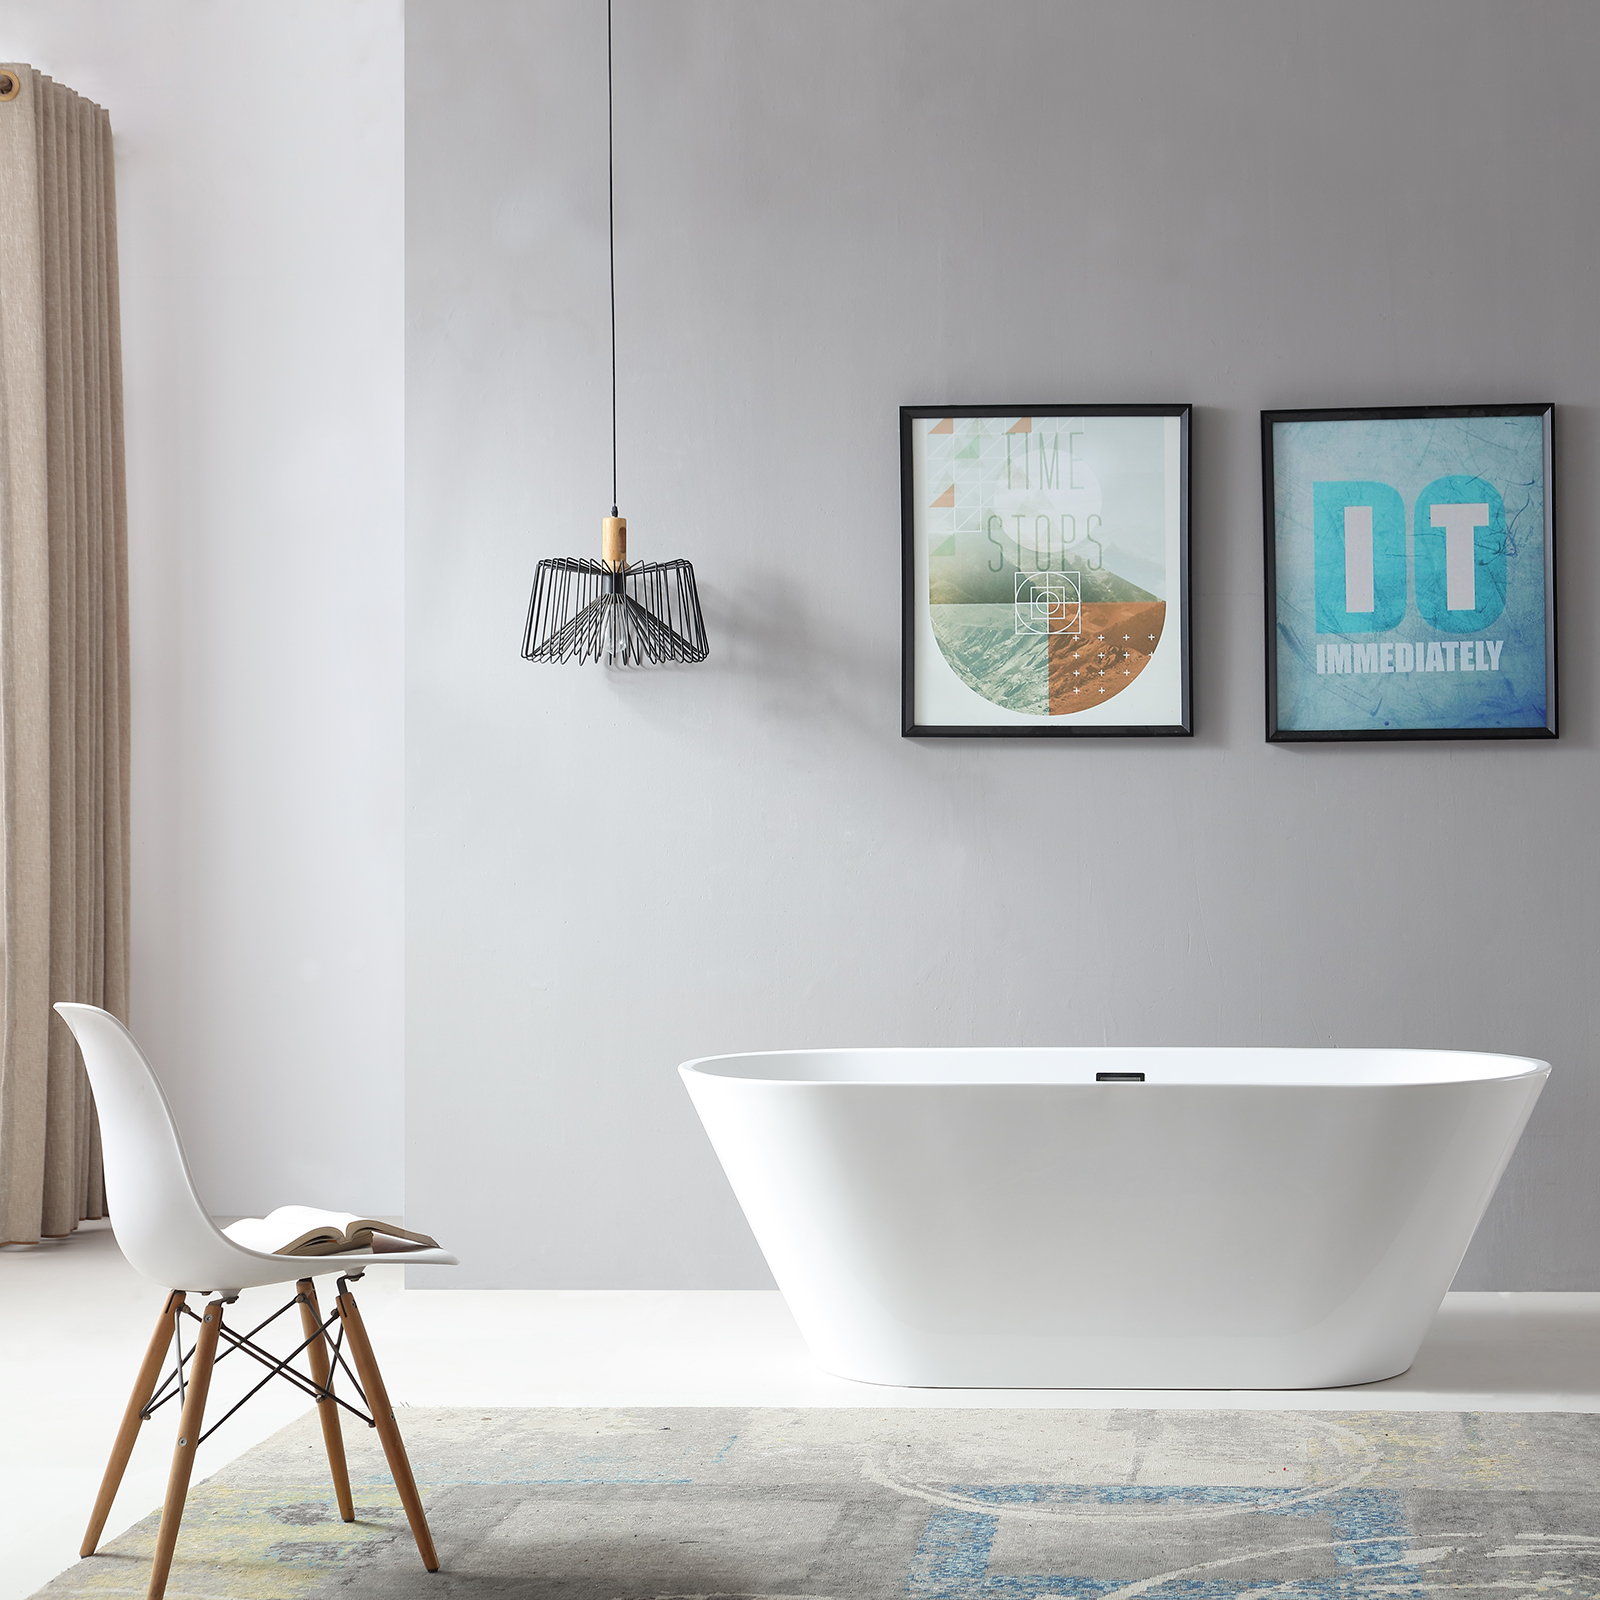 Freistehende Badewanne LUGANO Acryl weiß OMS-771 170 x 74 cm inkl. Ab-/Überlauf inkl. Armatur 1521